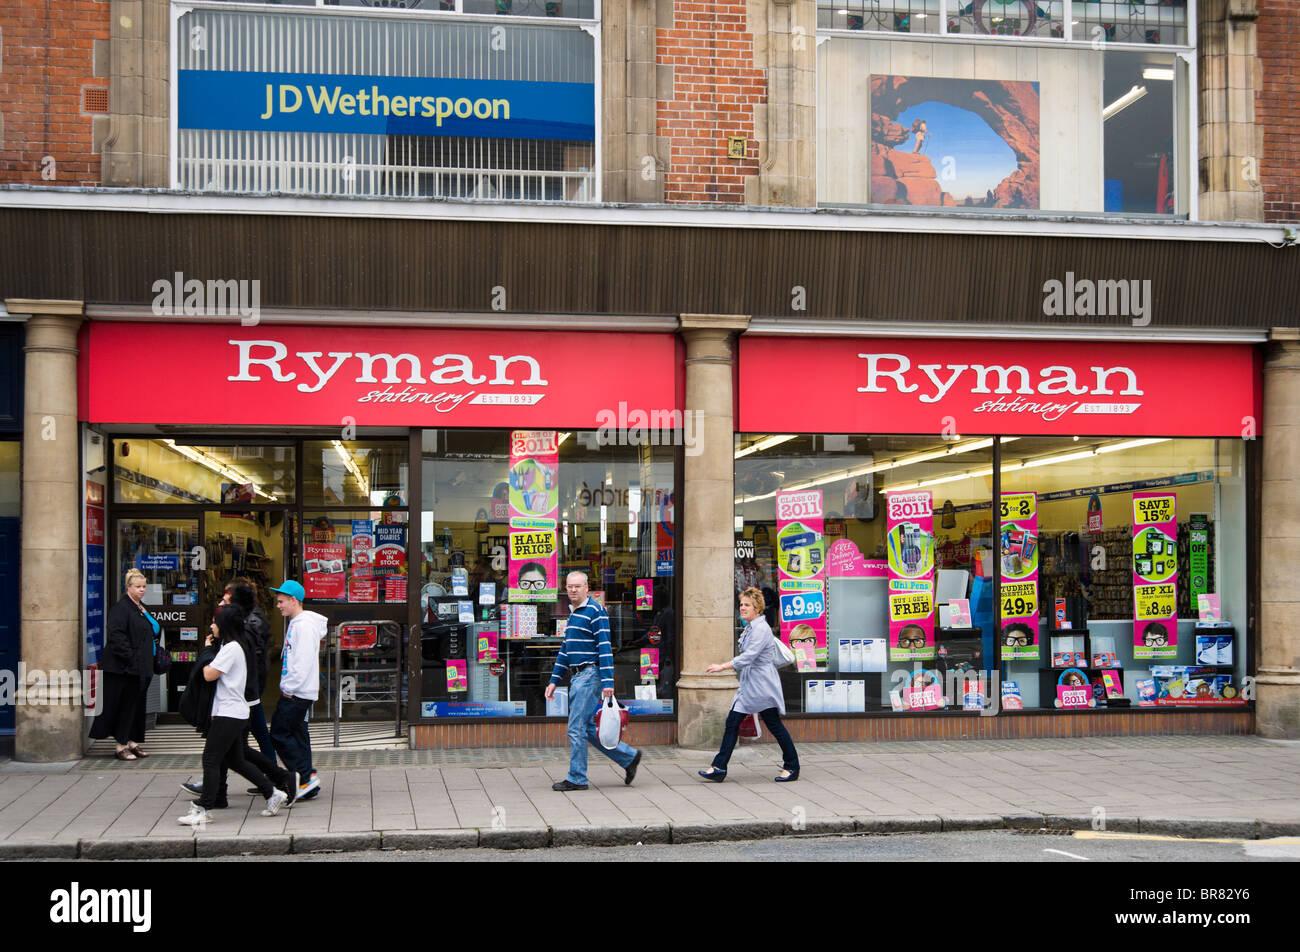 Ryman papeterie en centre-ville de Chester, Cheshire, Angleterre, RU Photo Stock